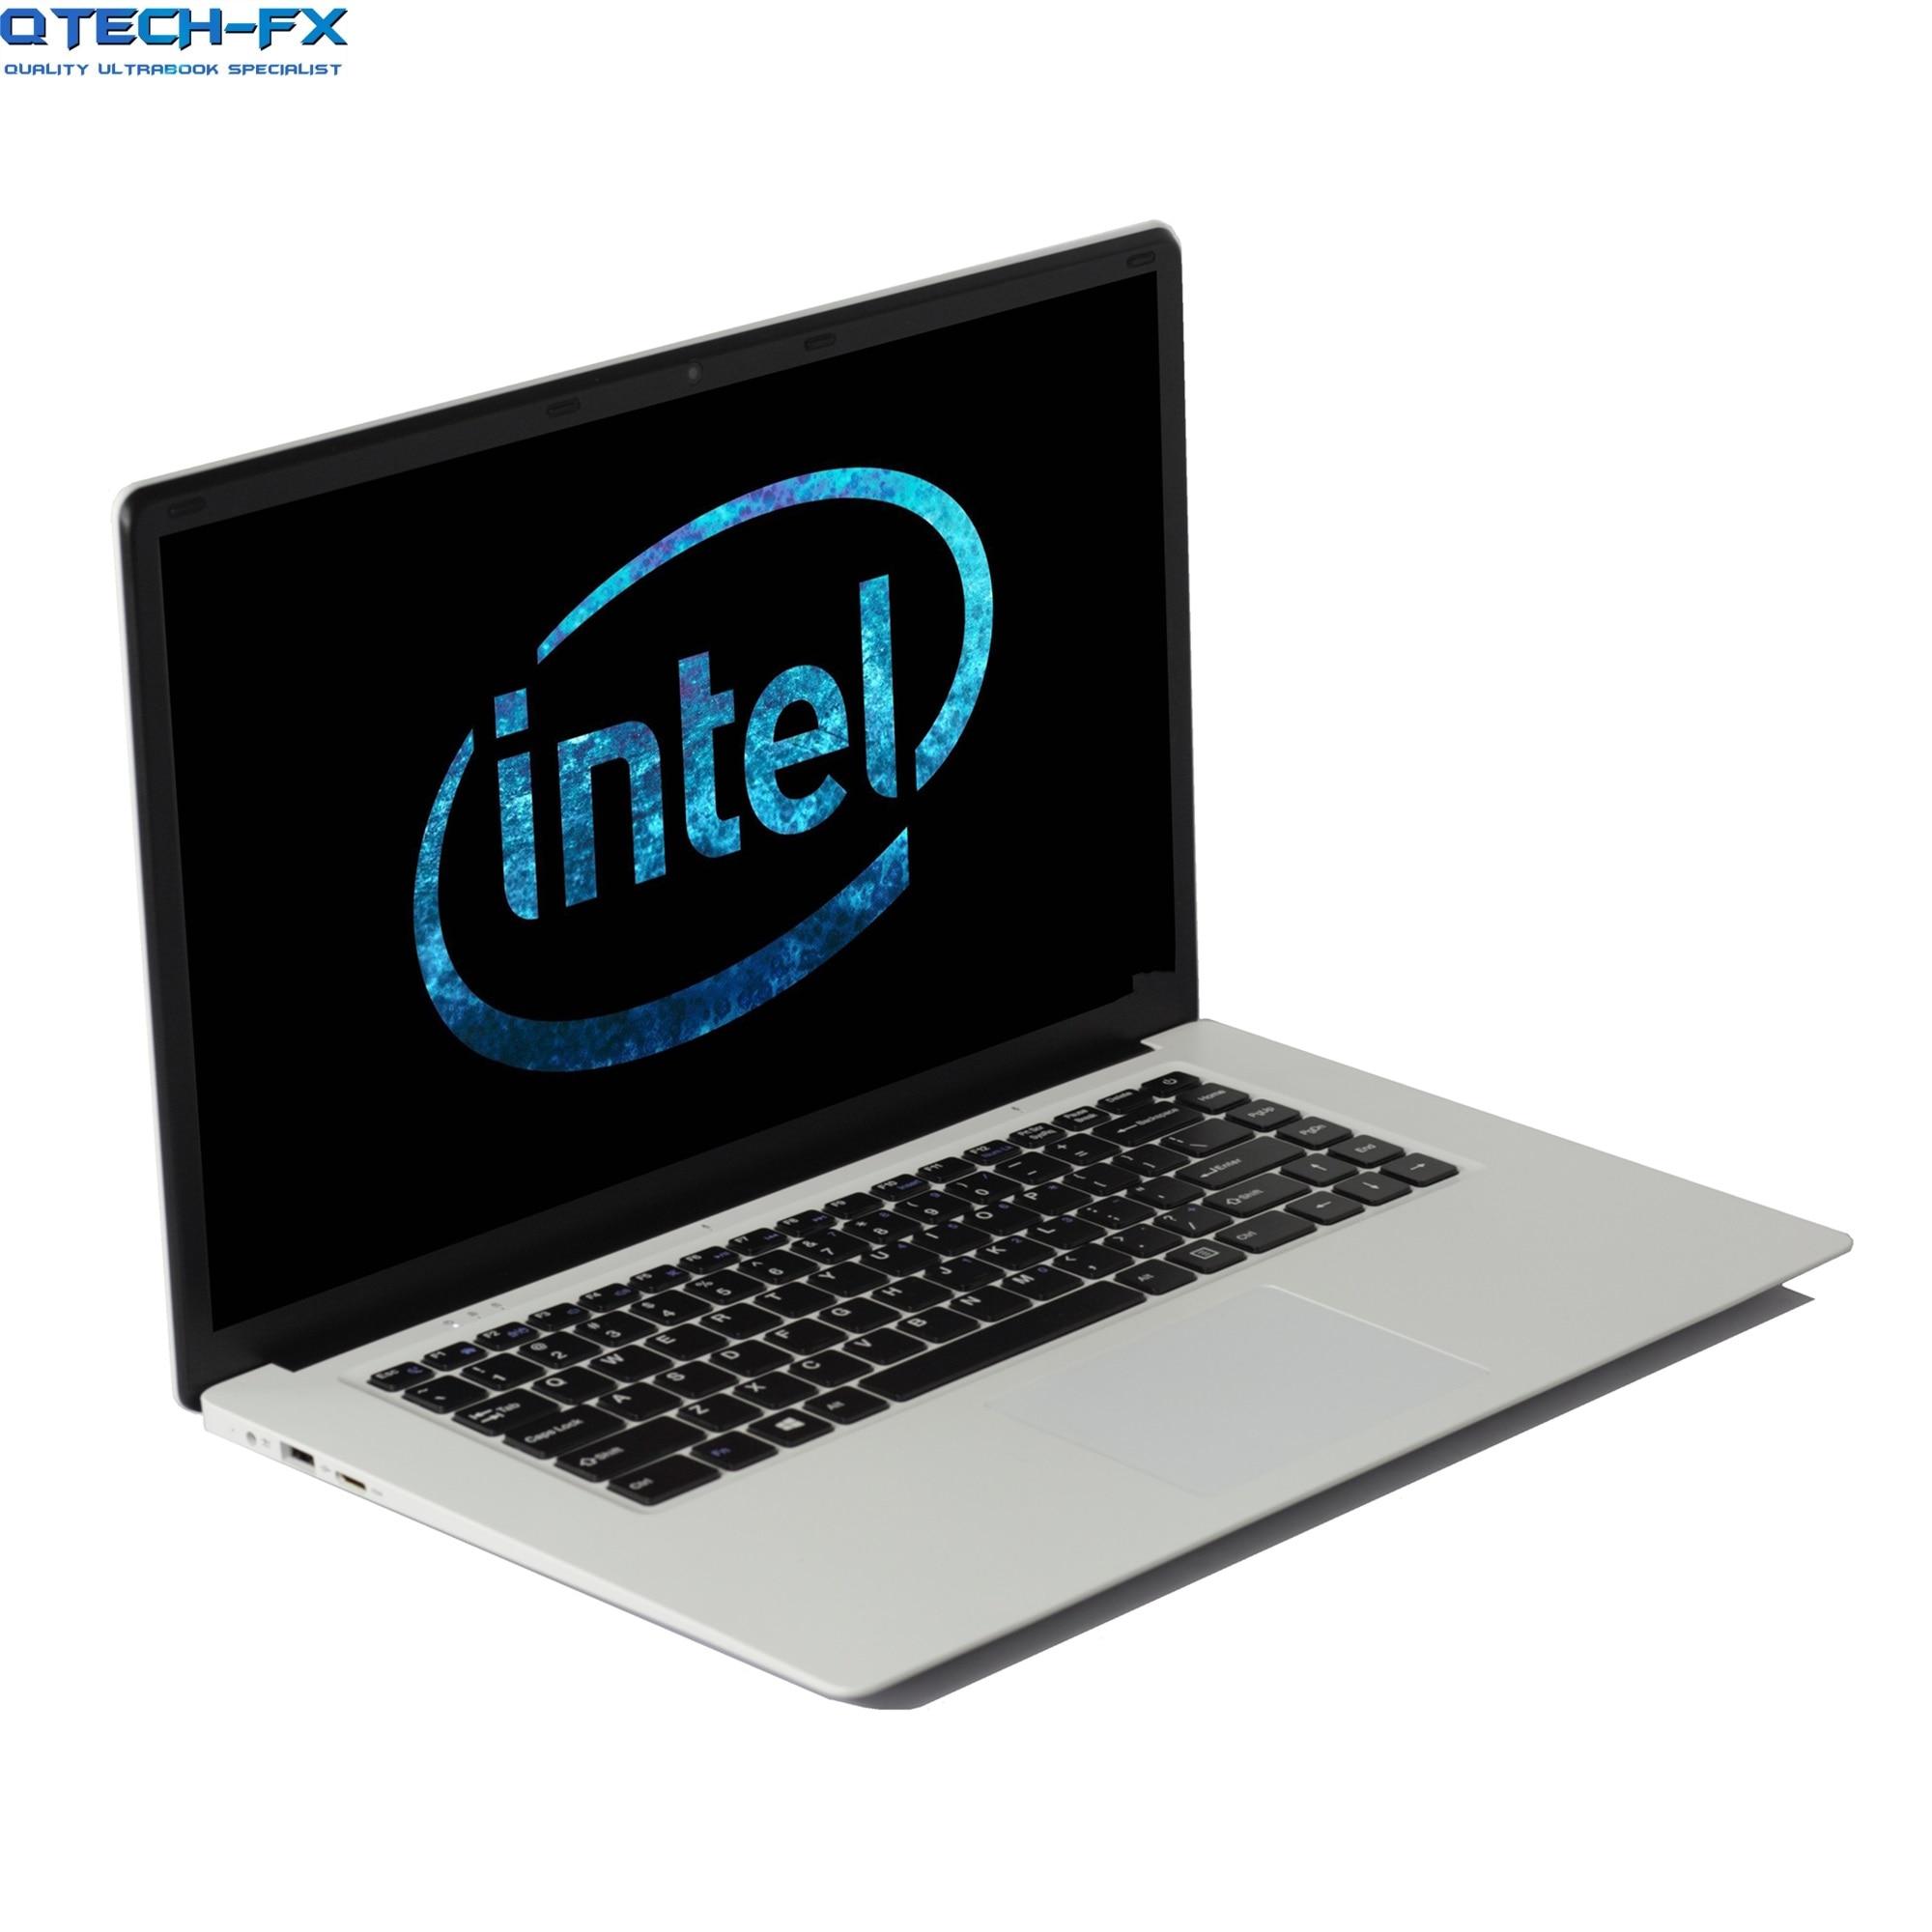 "15.6"" SSD Ultrabook 256GB /480GB 8GB 1920*1080p Windows10 Intel 4 Core Business School Arabics AZERTY Spanish Russian Keyboard"